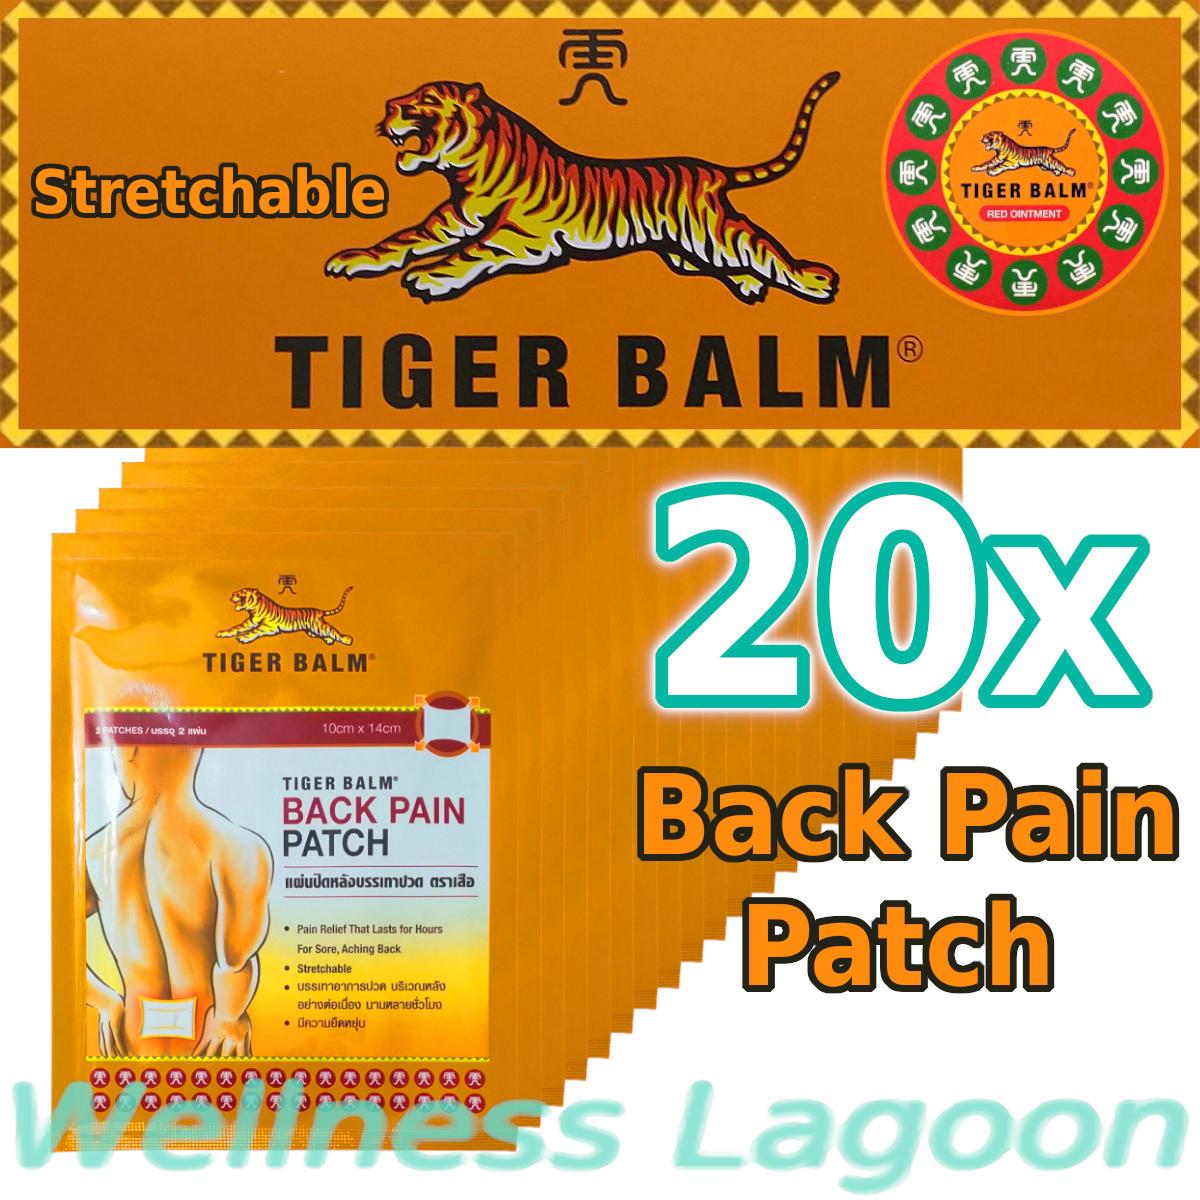 20x Tiger Balm Back Pain Patch - Stretchable (10cm x 14cm)